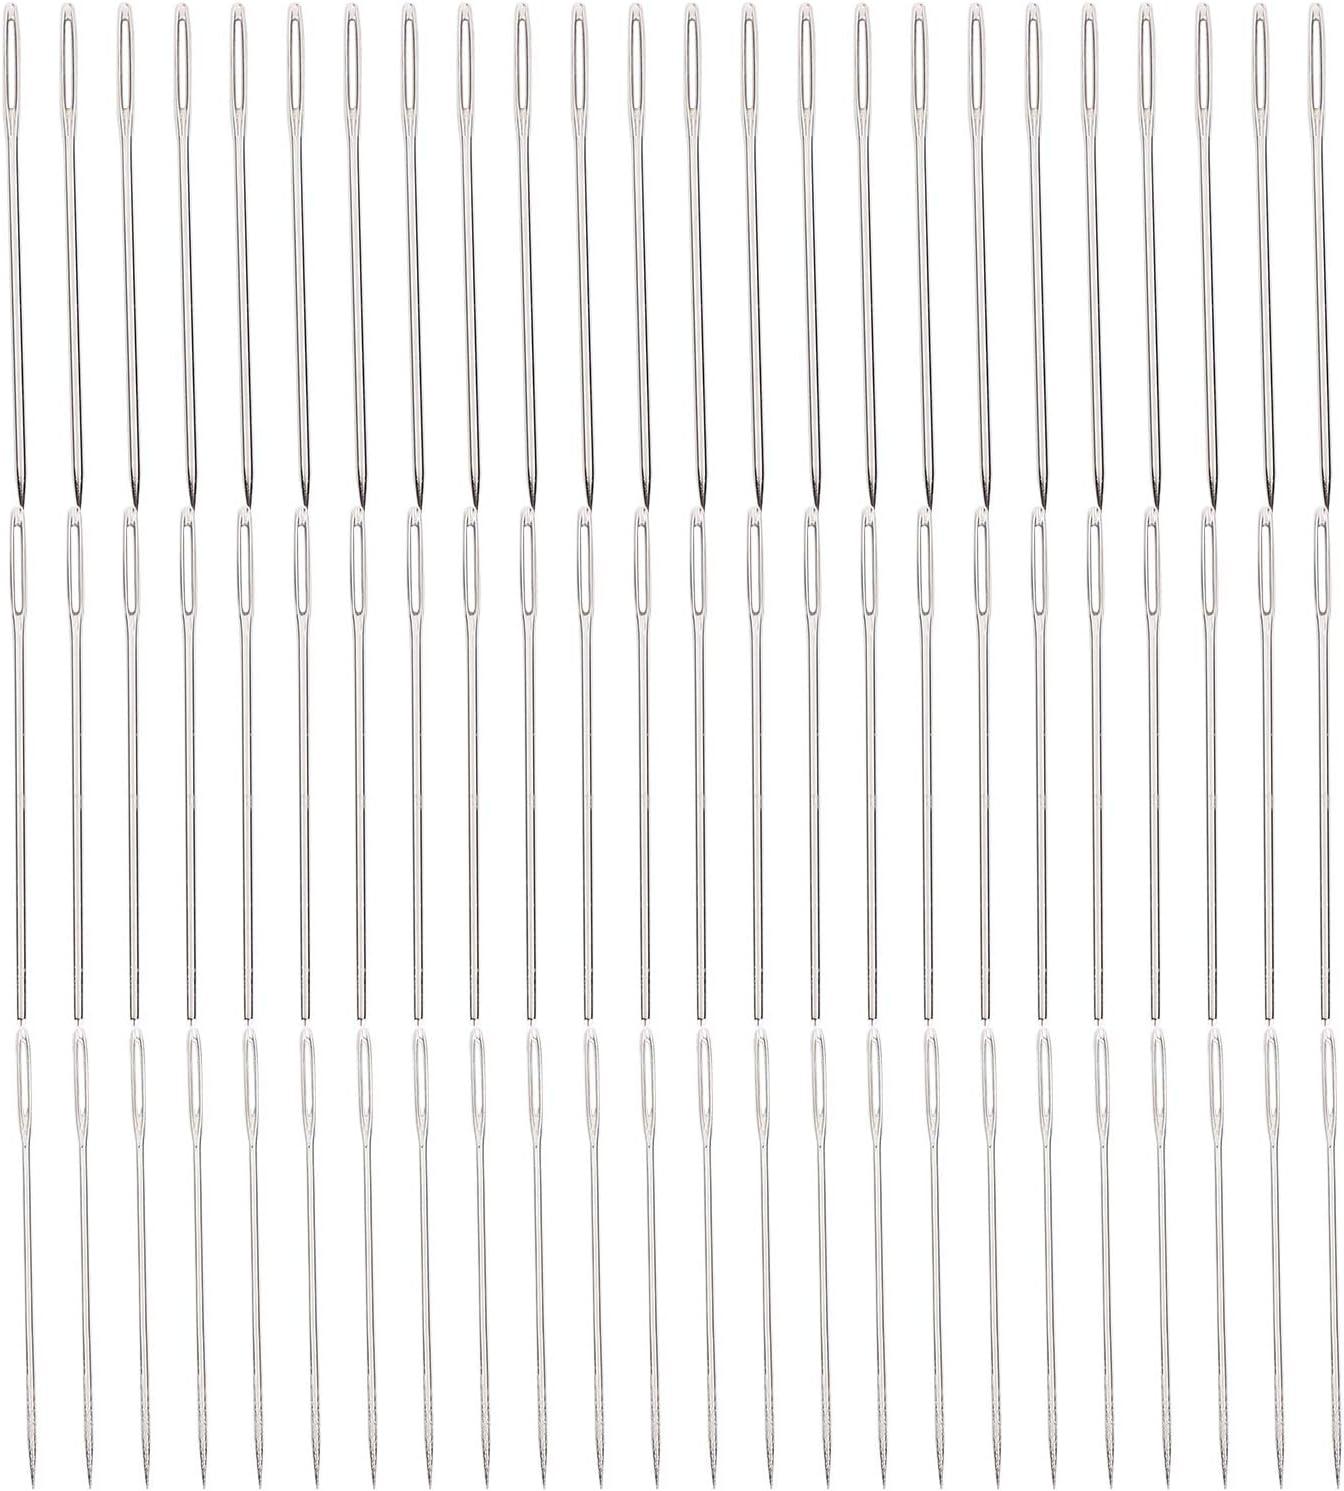 Sewing Needles Tools Ranking TOP11 Hand 120Pcs Long Beach Mall